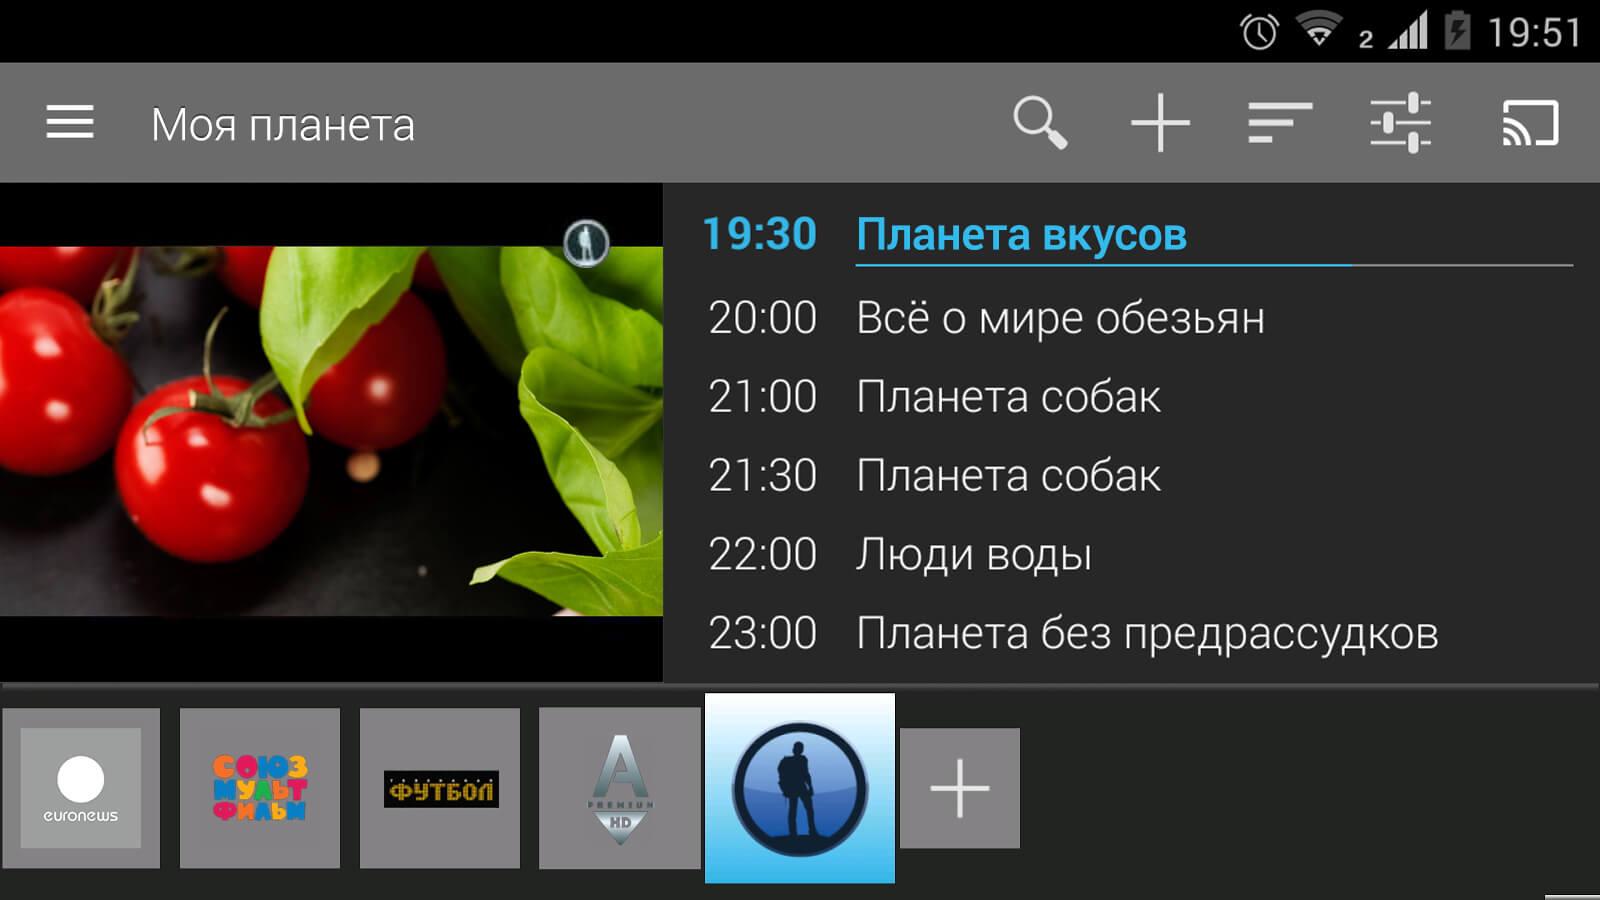 SPB TV (2)